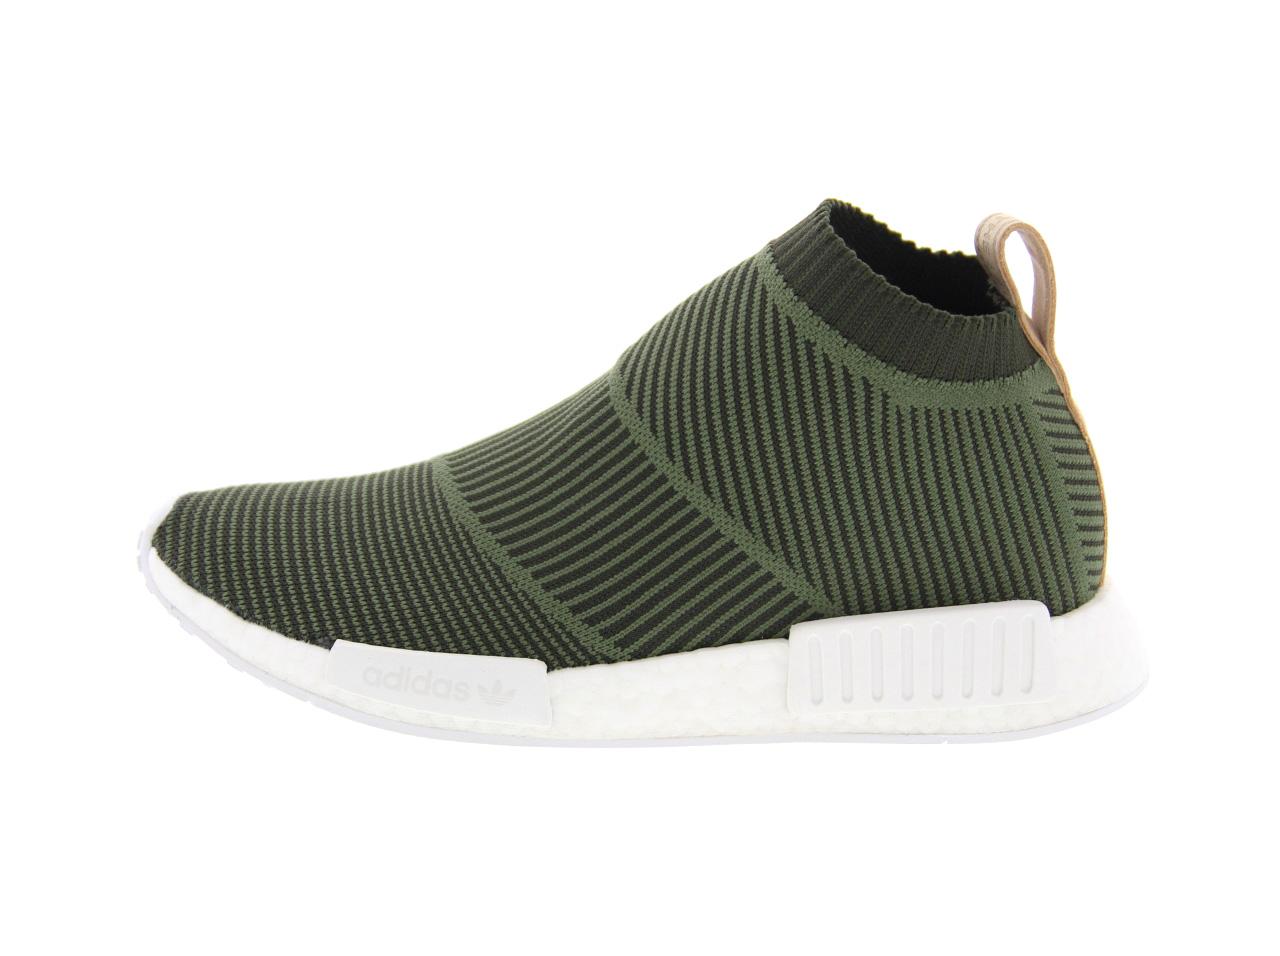 adidas NMD_CS1 PK(B37638)【アディダス NMD CS1 プライムニット】【メンズファッション】【シューズ】【スニーカー】【靴】【フットウェア】【バーゲン】【ストアレビュー記載でソックスプレゼント対象品】